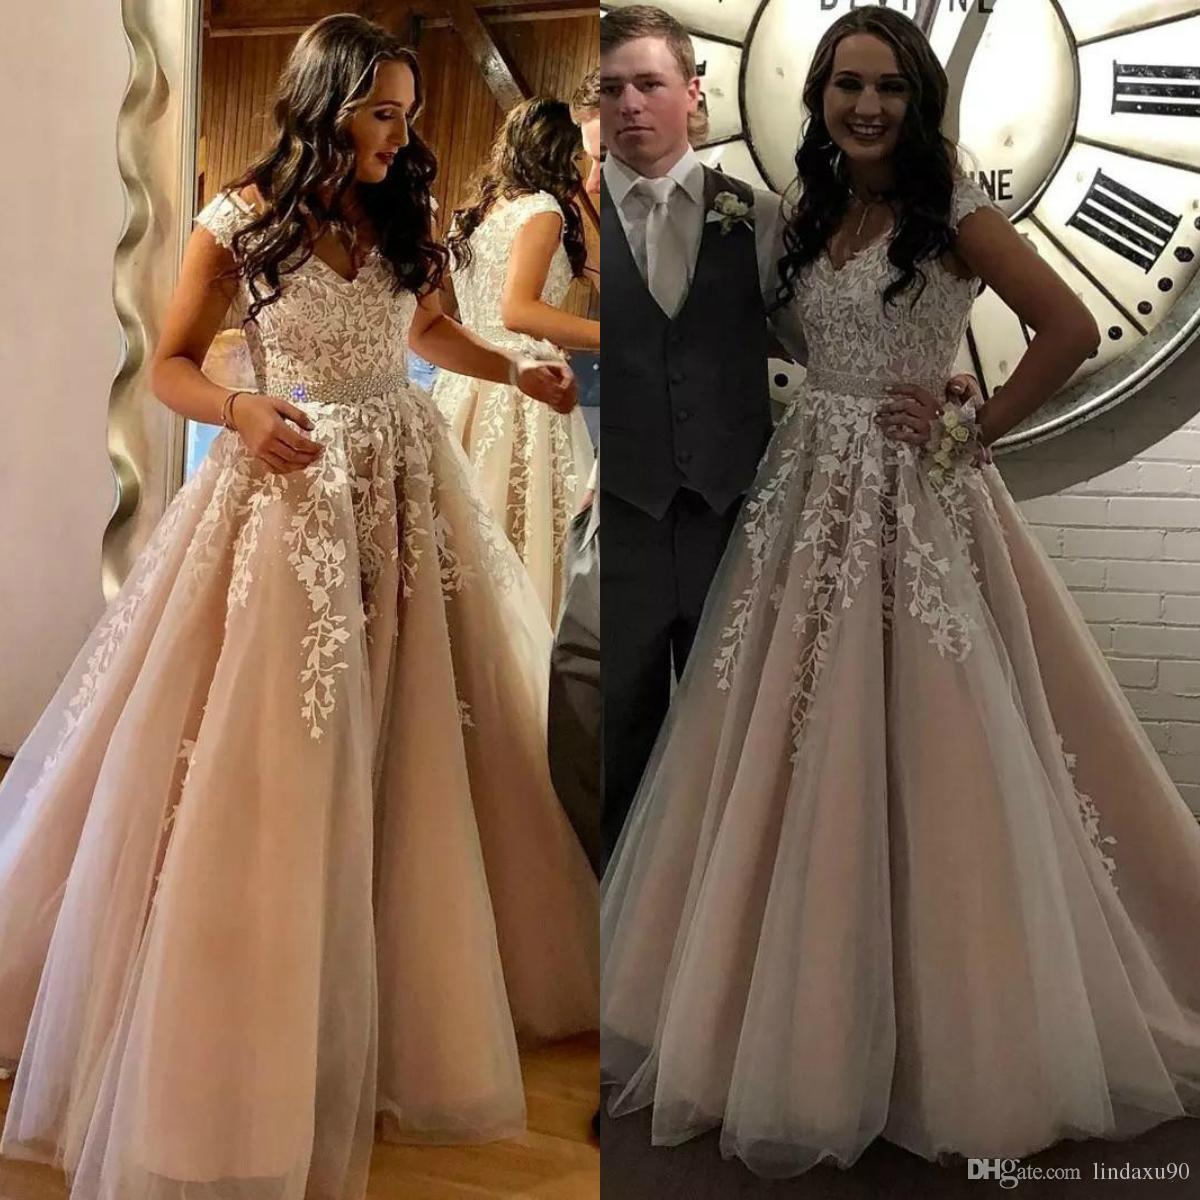 Designer Prom Dresses: New Designer Blush Prom Dresses 2019 A Line Lace Applique